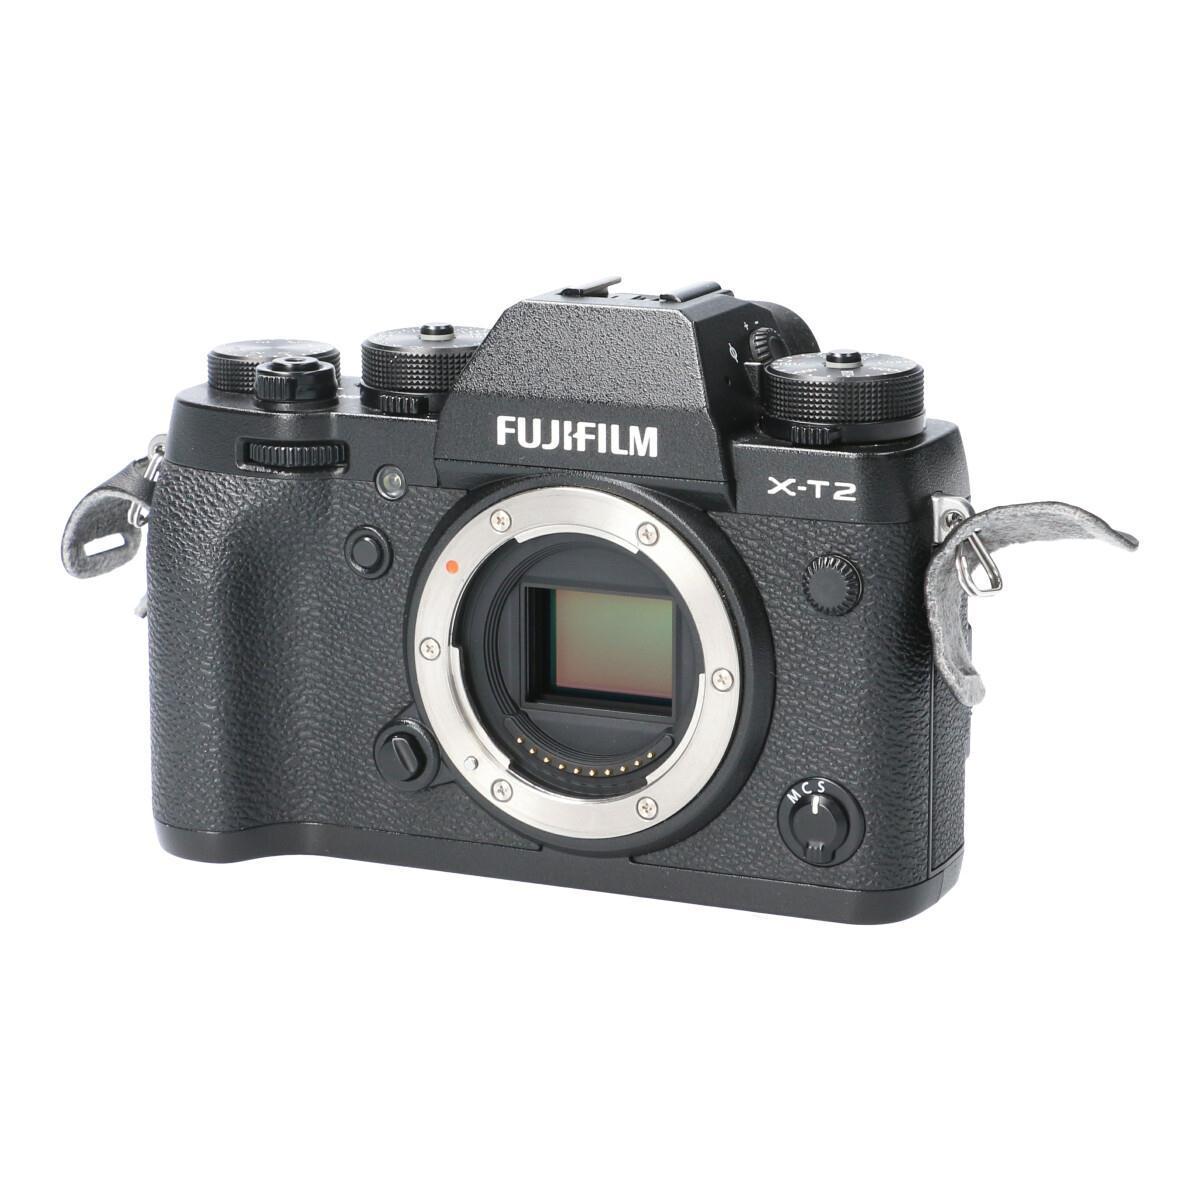 FUJIFILM X-T2 BLACK【中古】